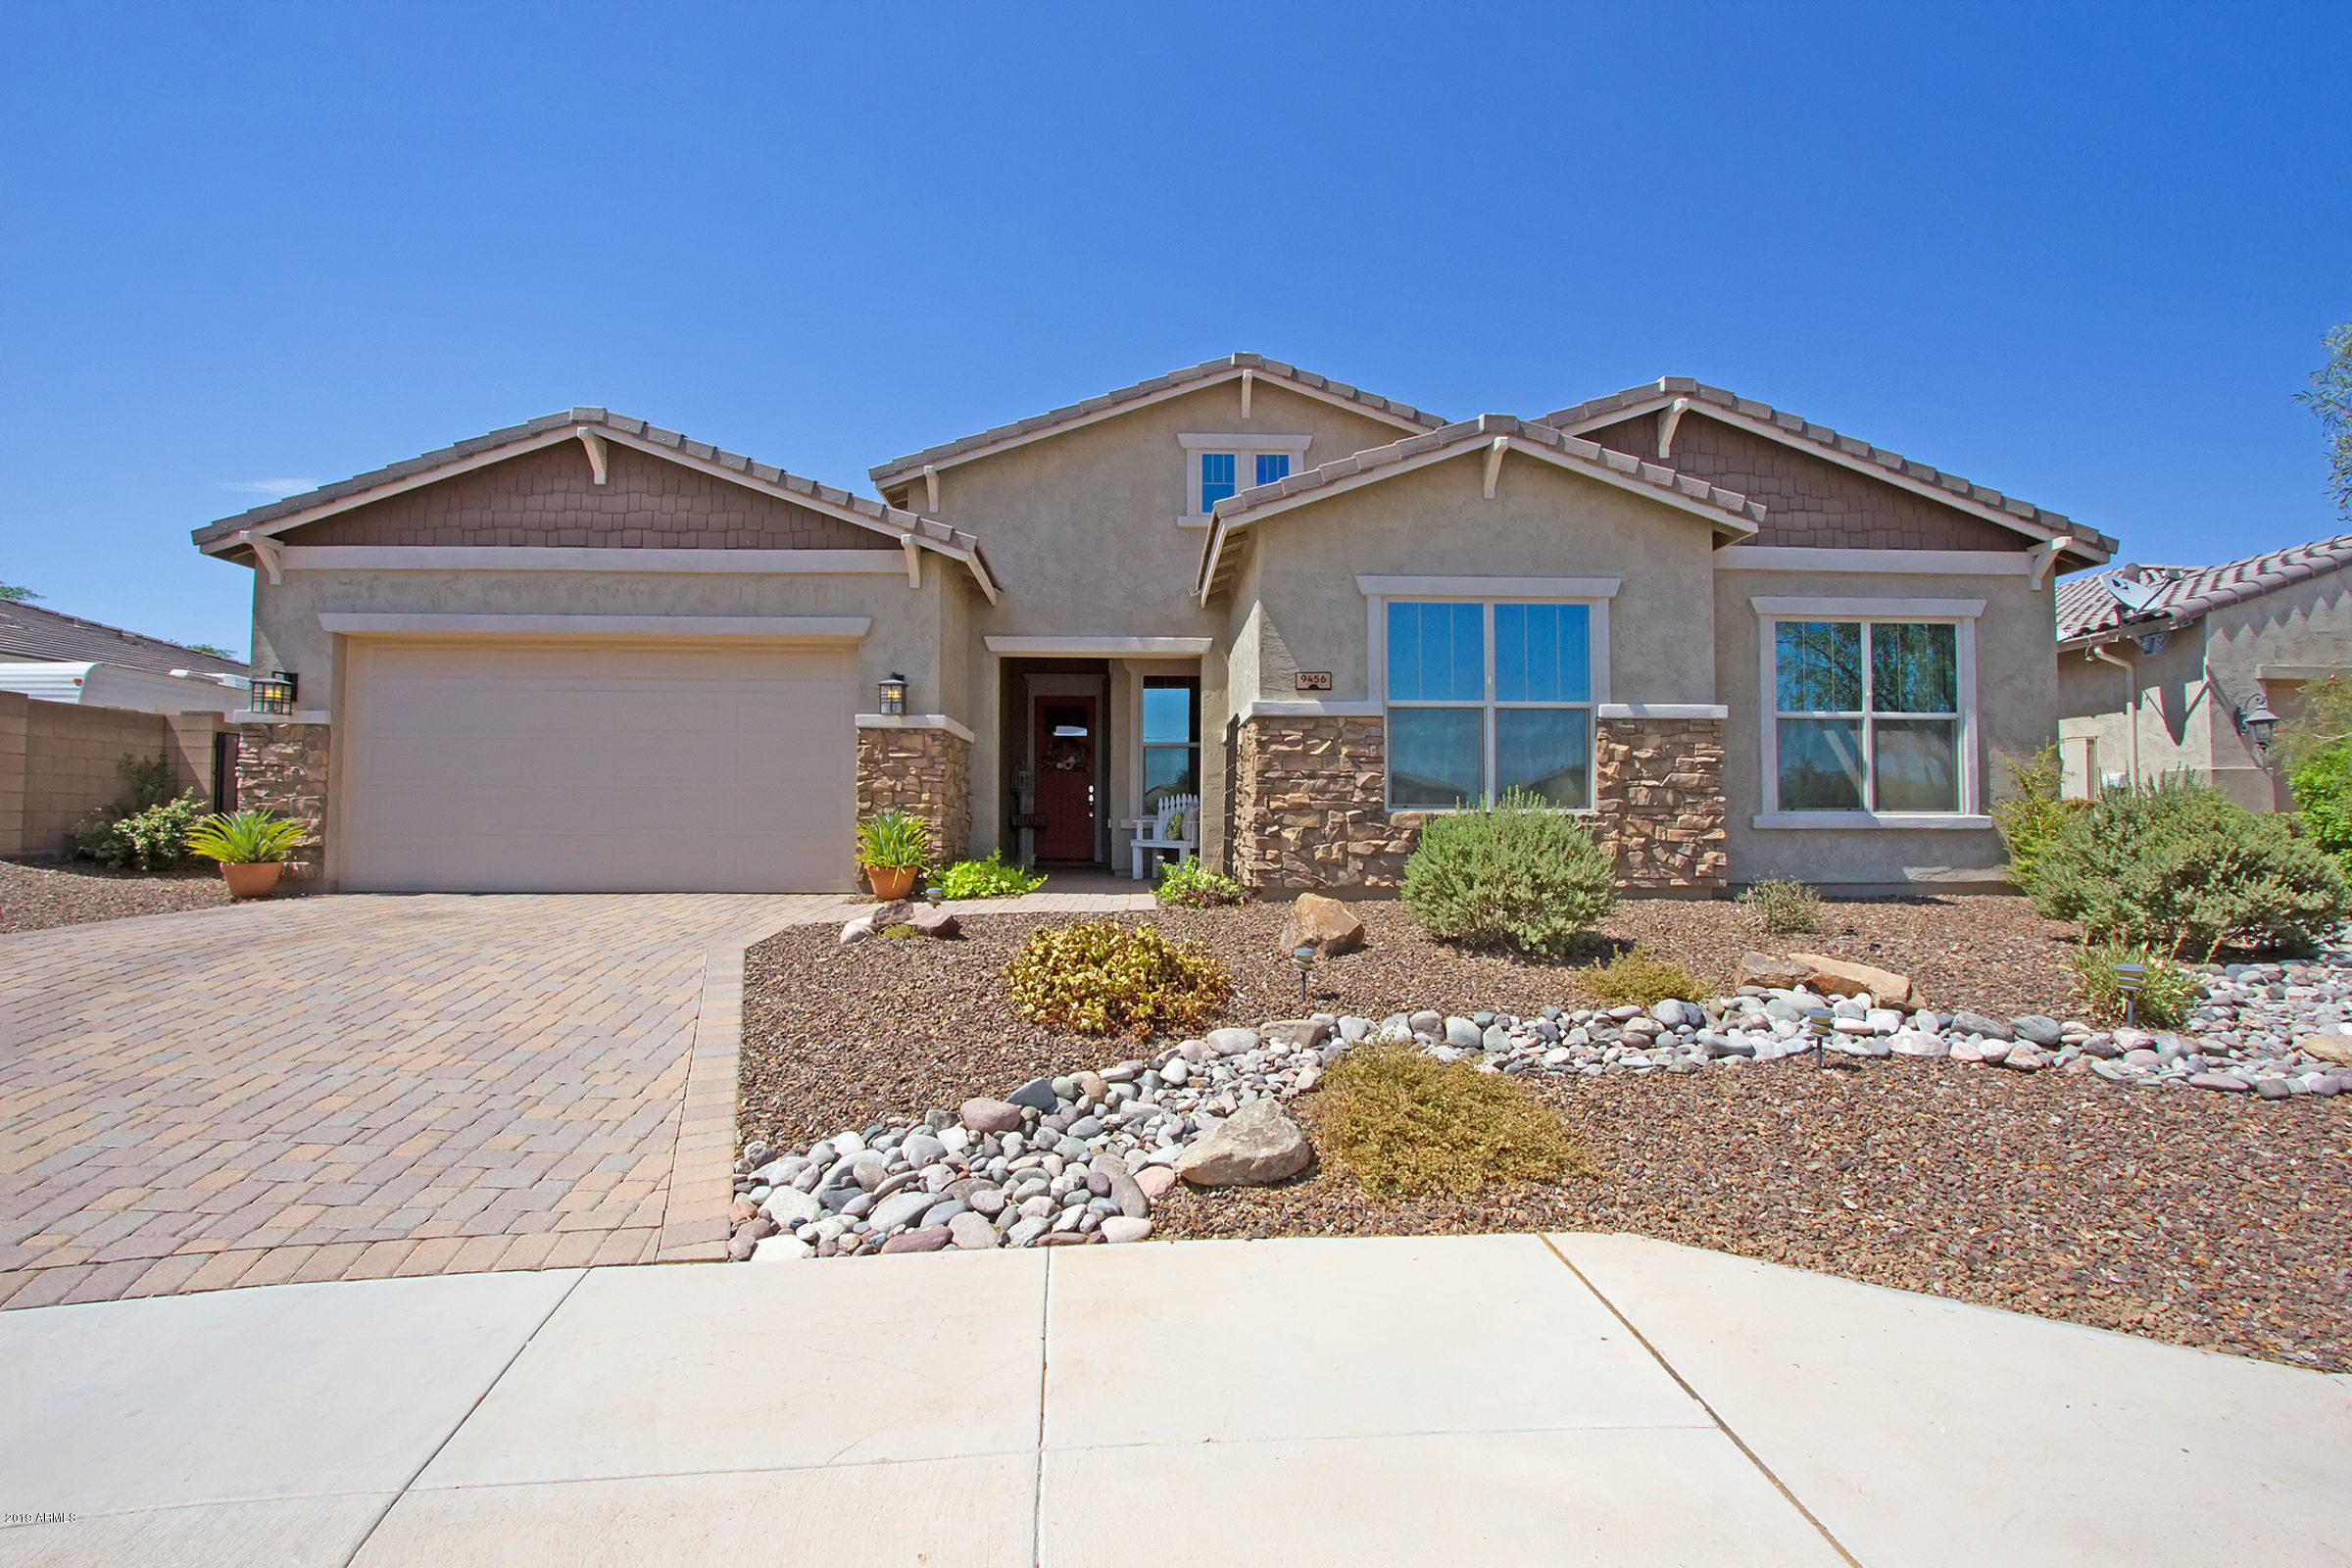 9456 W VIA DEL SOL --, Peoria, Arizona